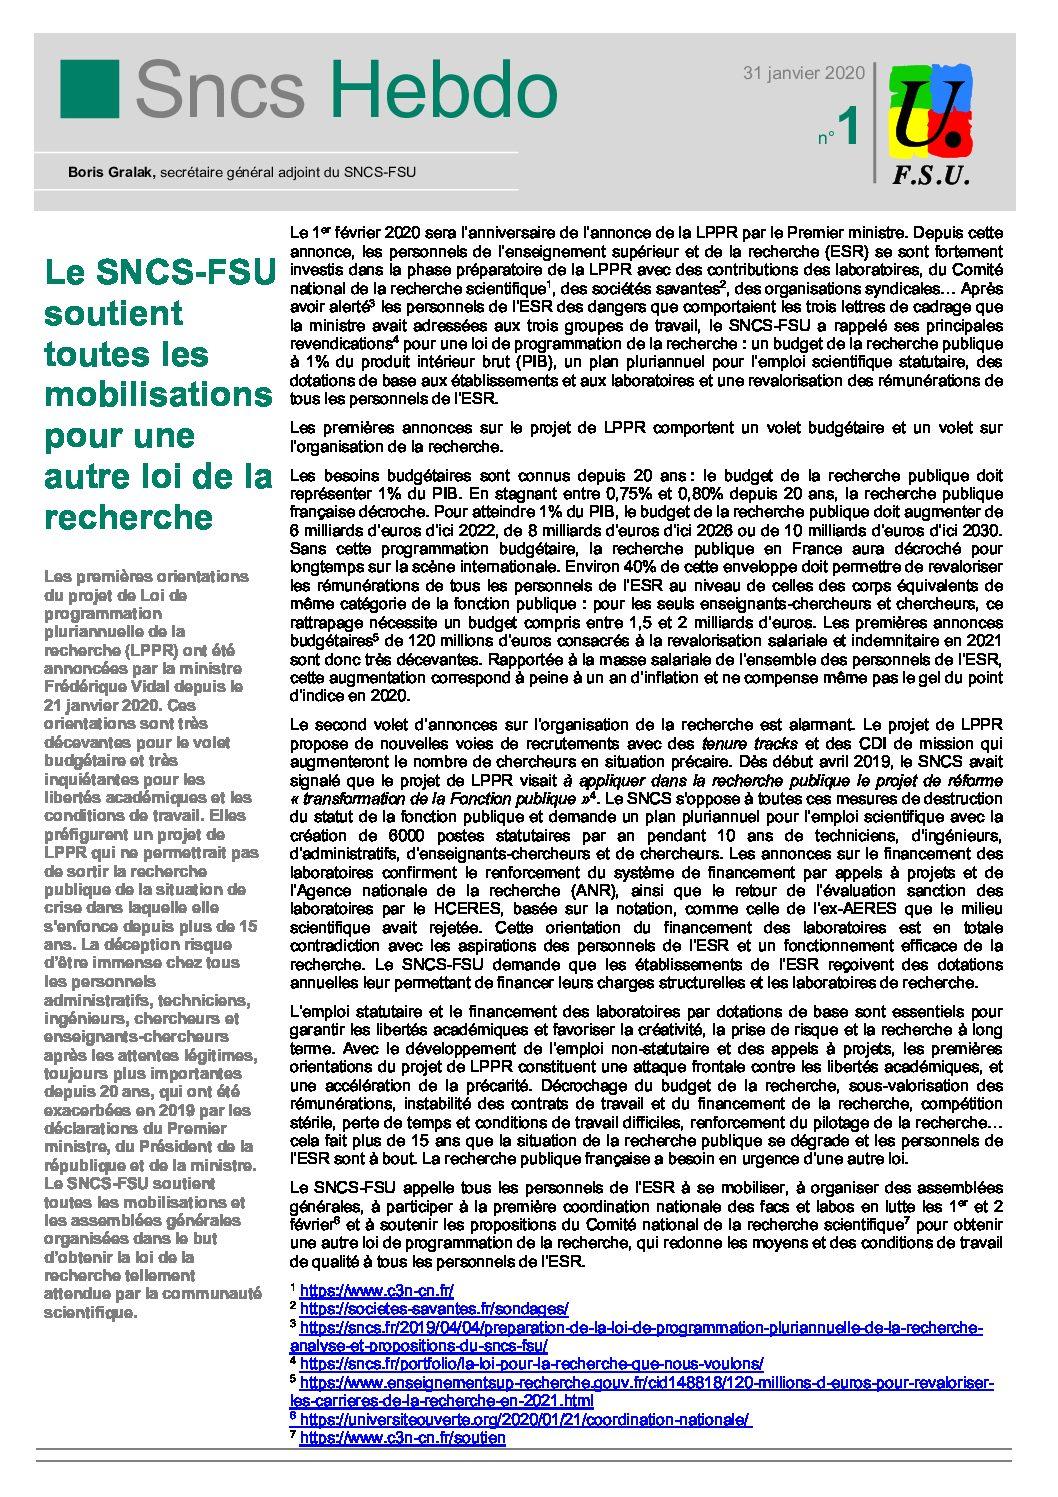 SNCS-Hebdo_LPPR.1-2020-1-pdf.jpg